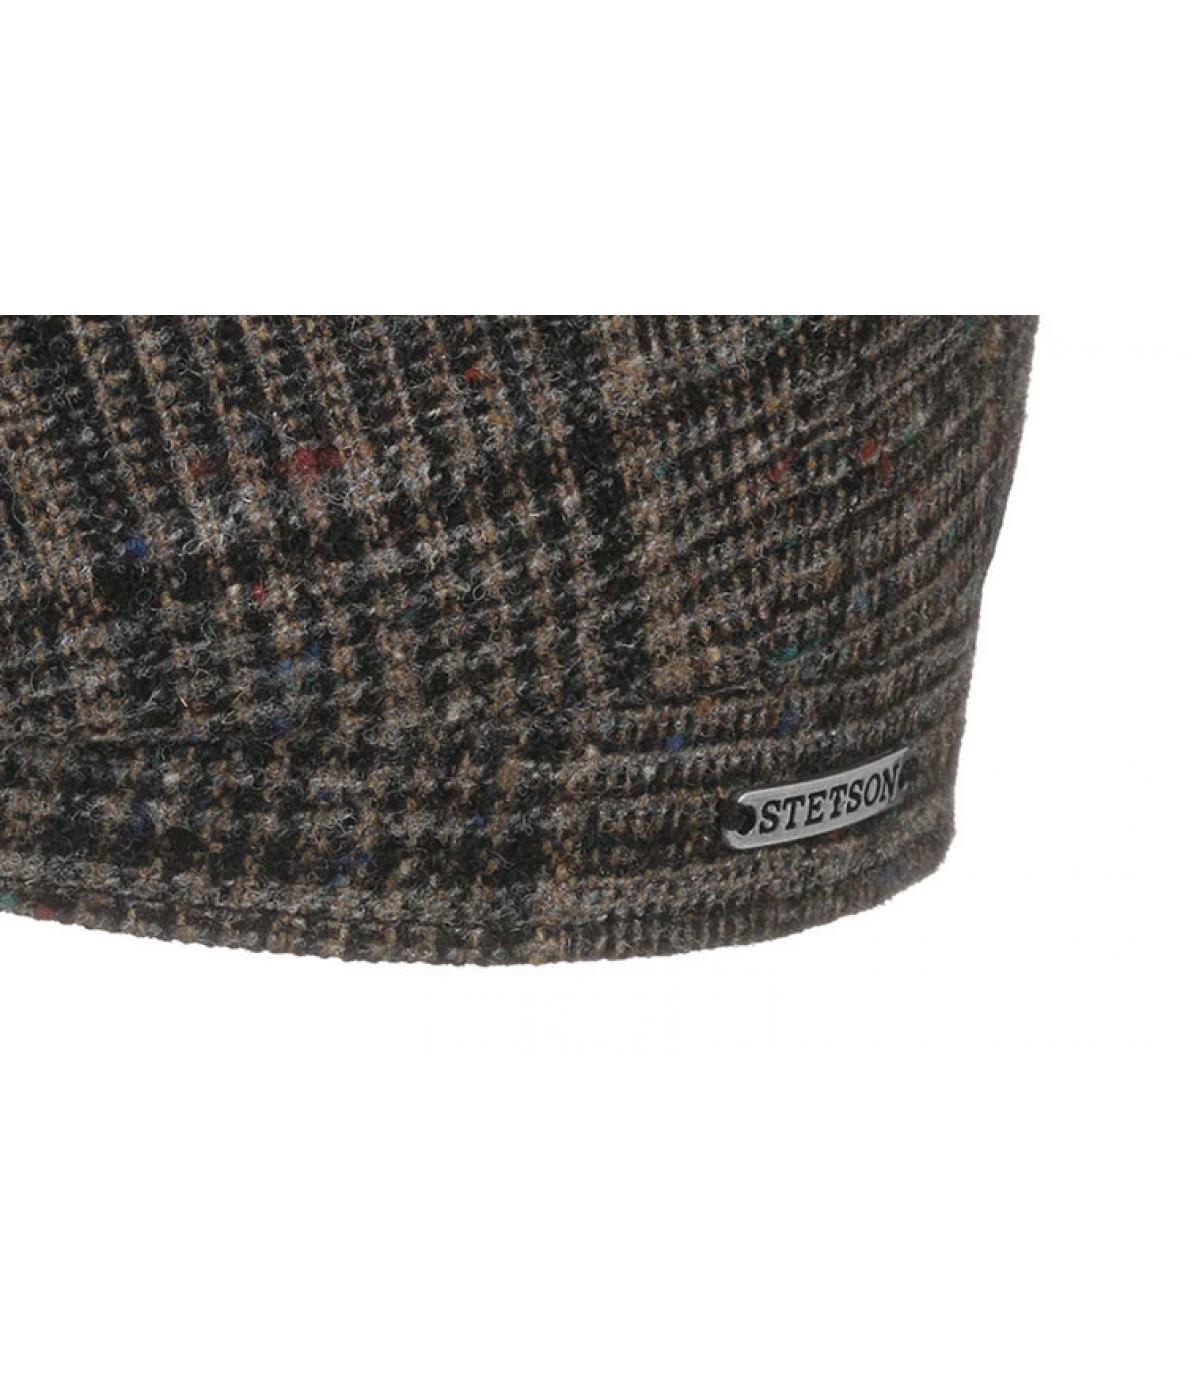 Detalles Hatteras Wool brown check imagen 3